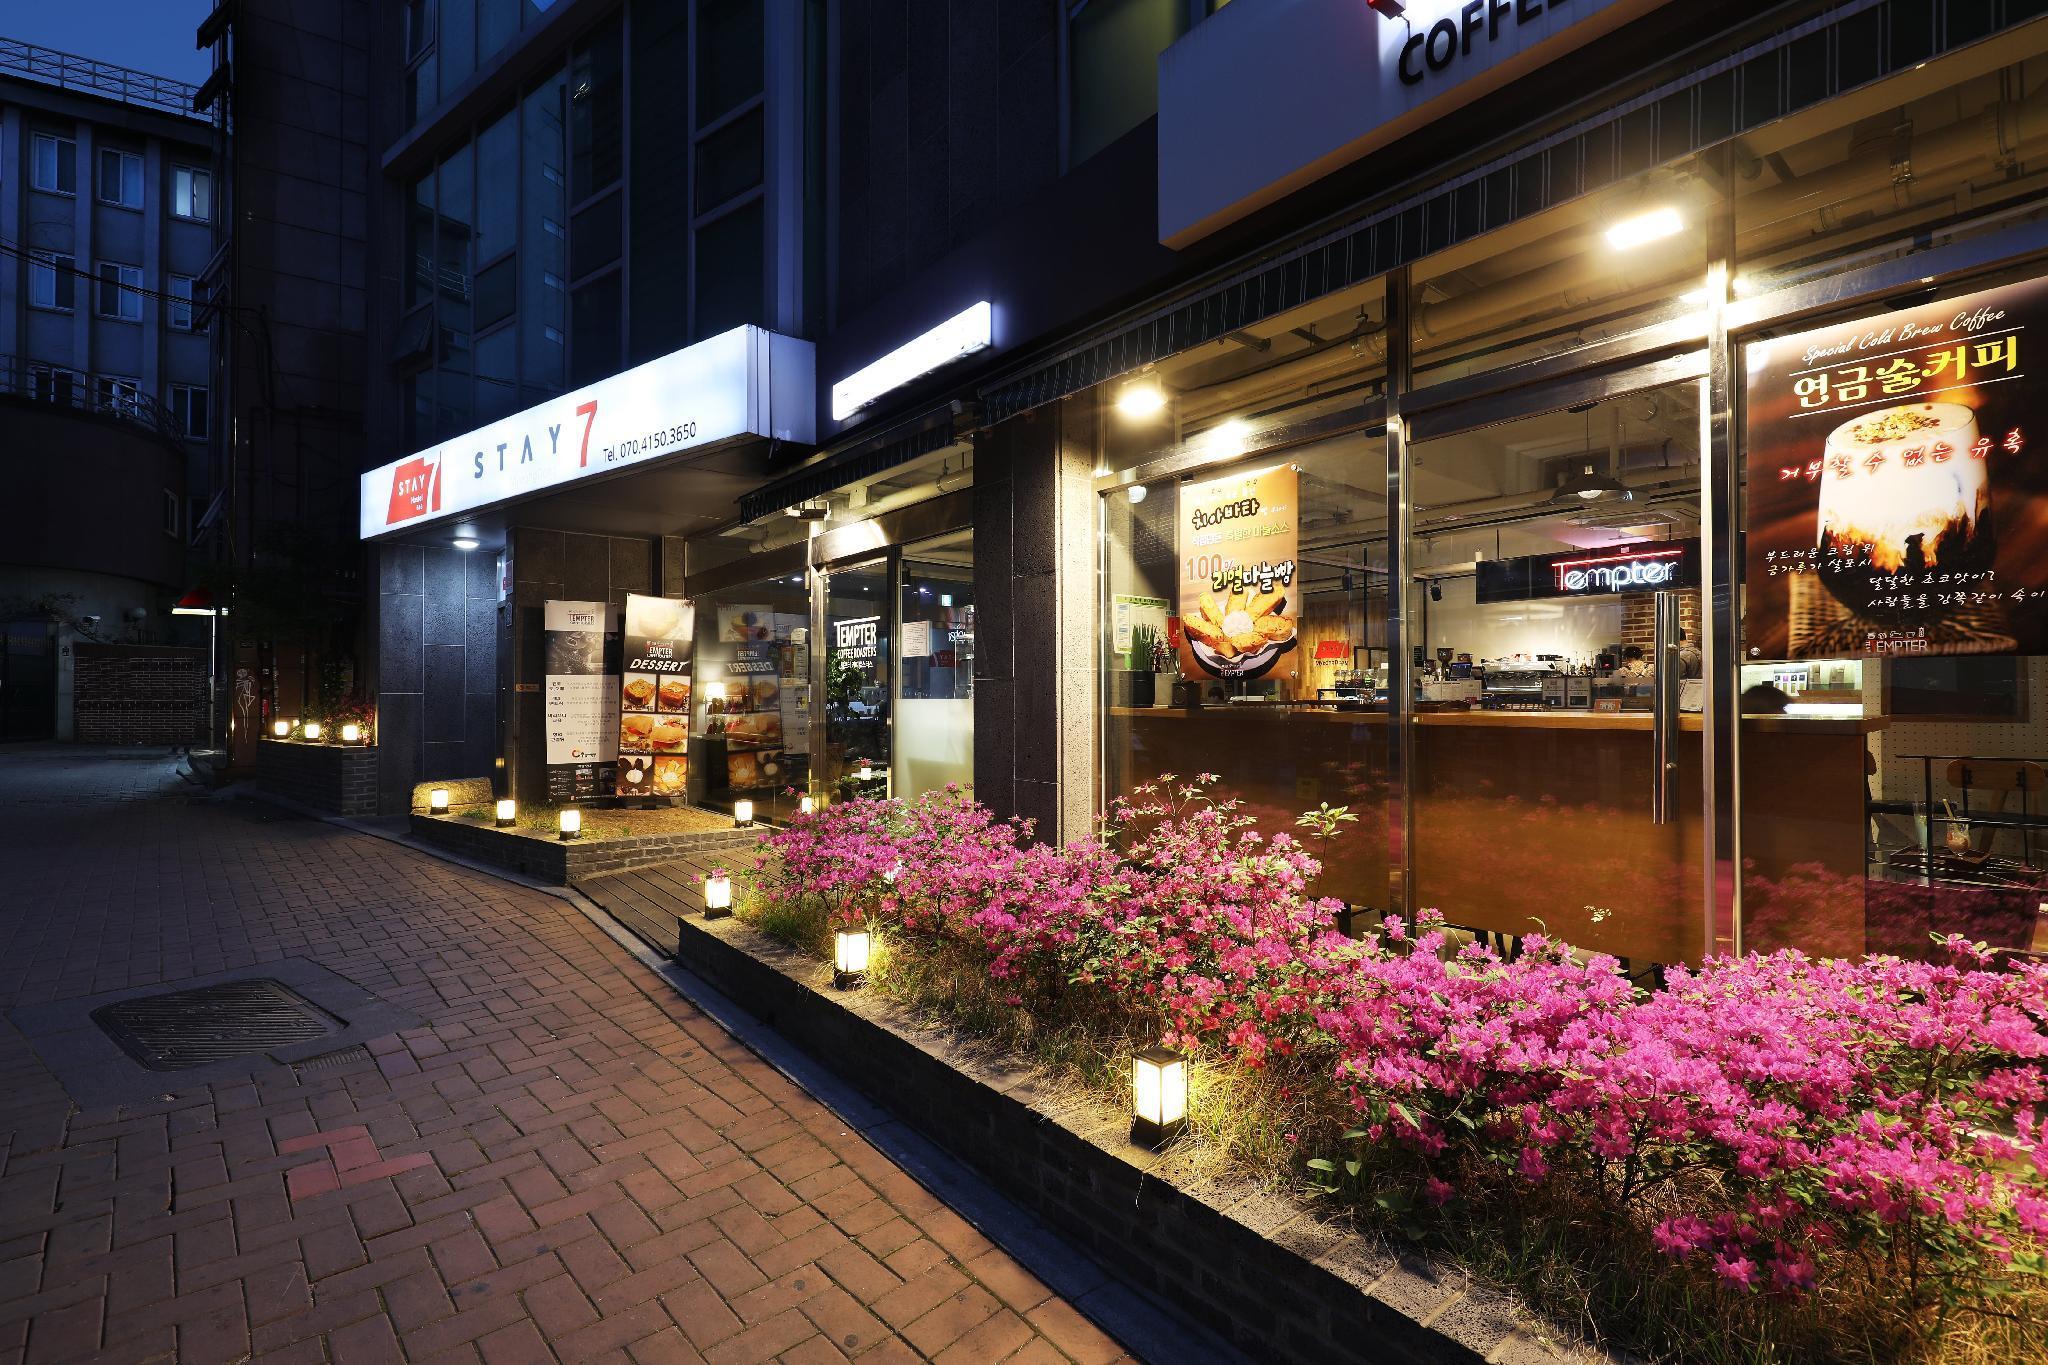 Stay7 Hostel Myeongdong